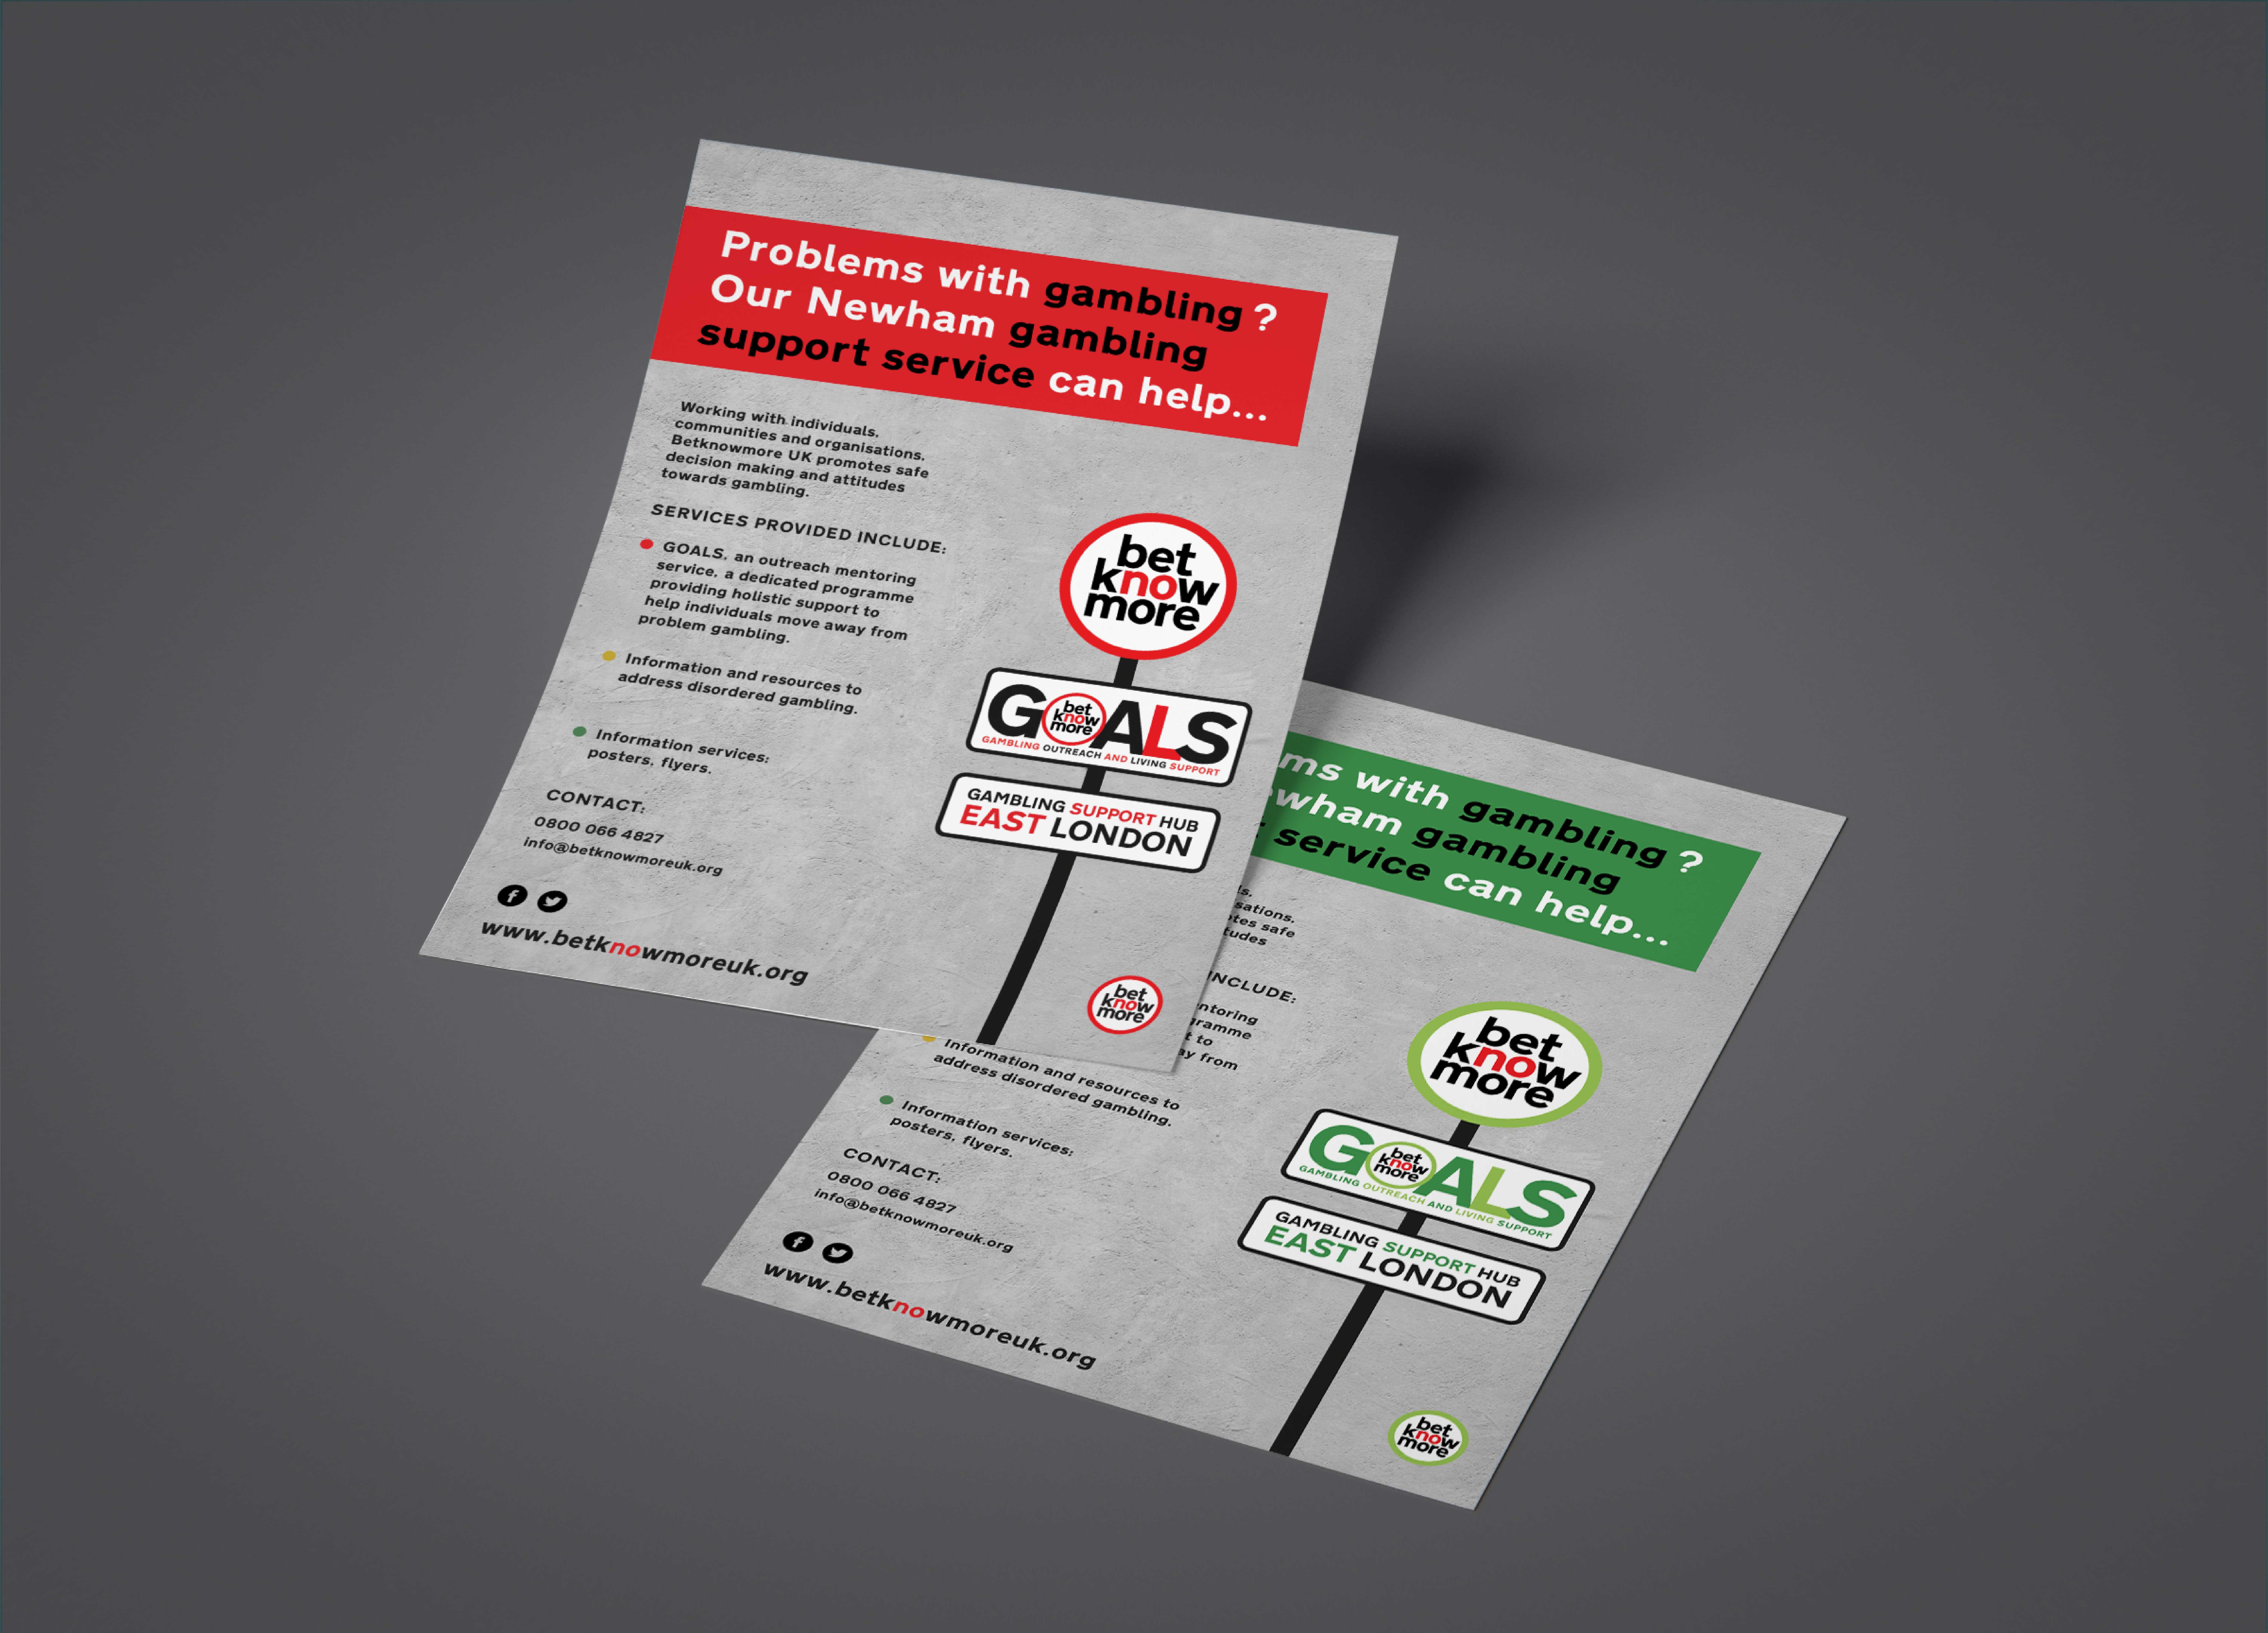 betknowmore leaflets